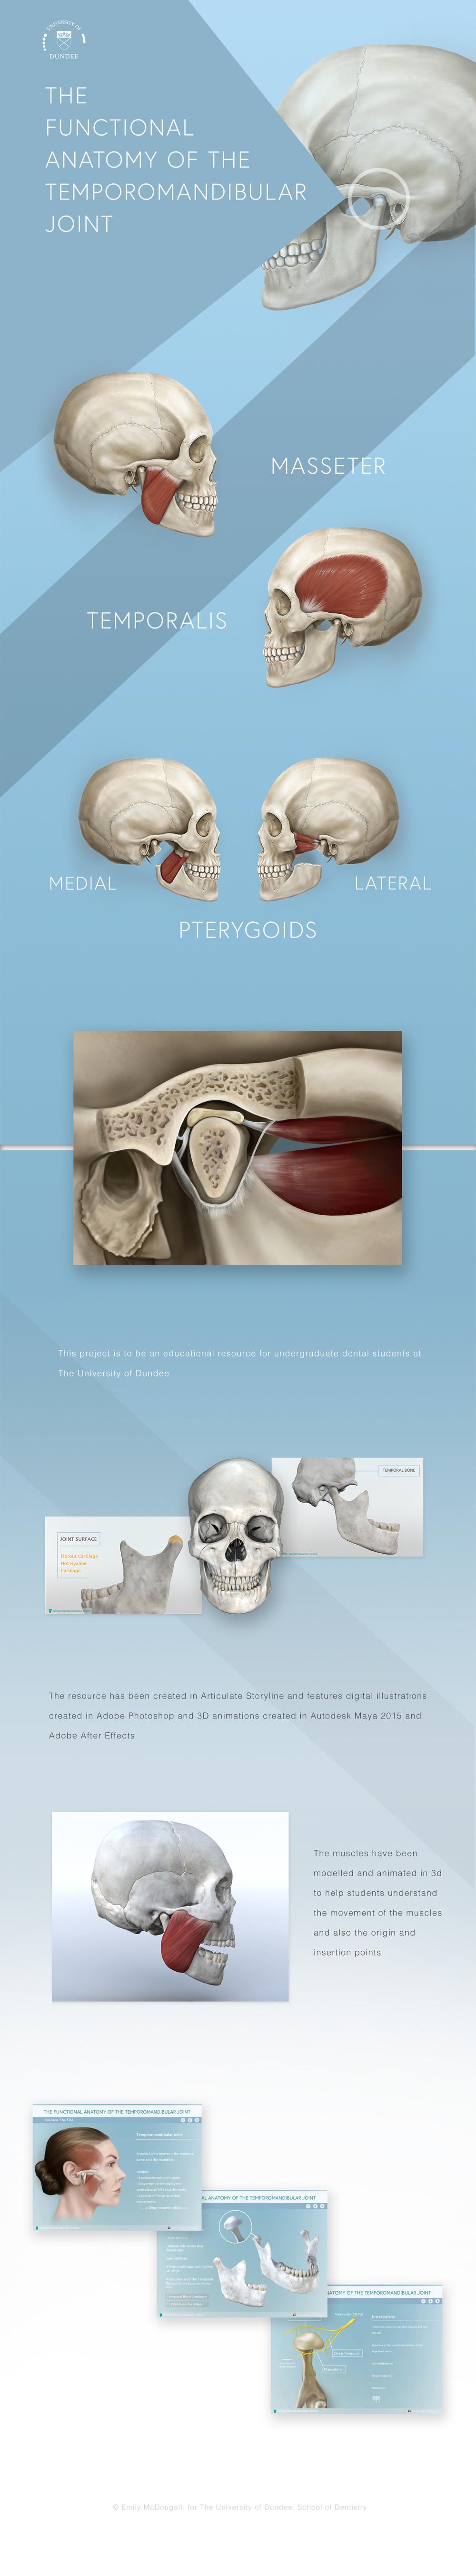 Functional_Anatomy_TMJ_Behance2.jpg